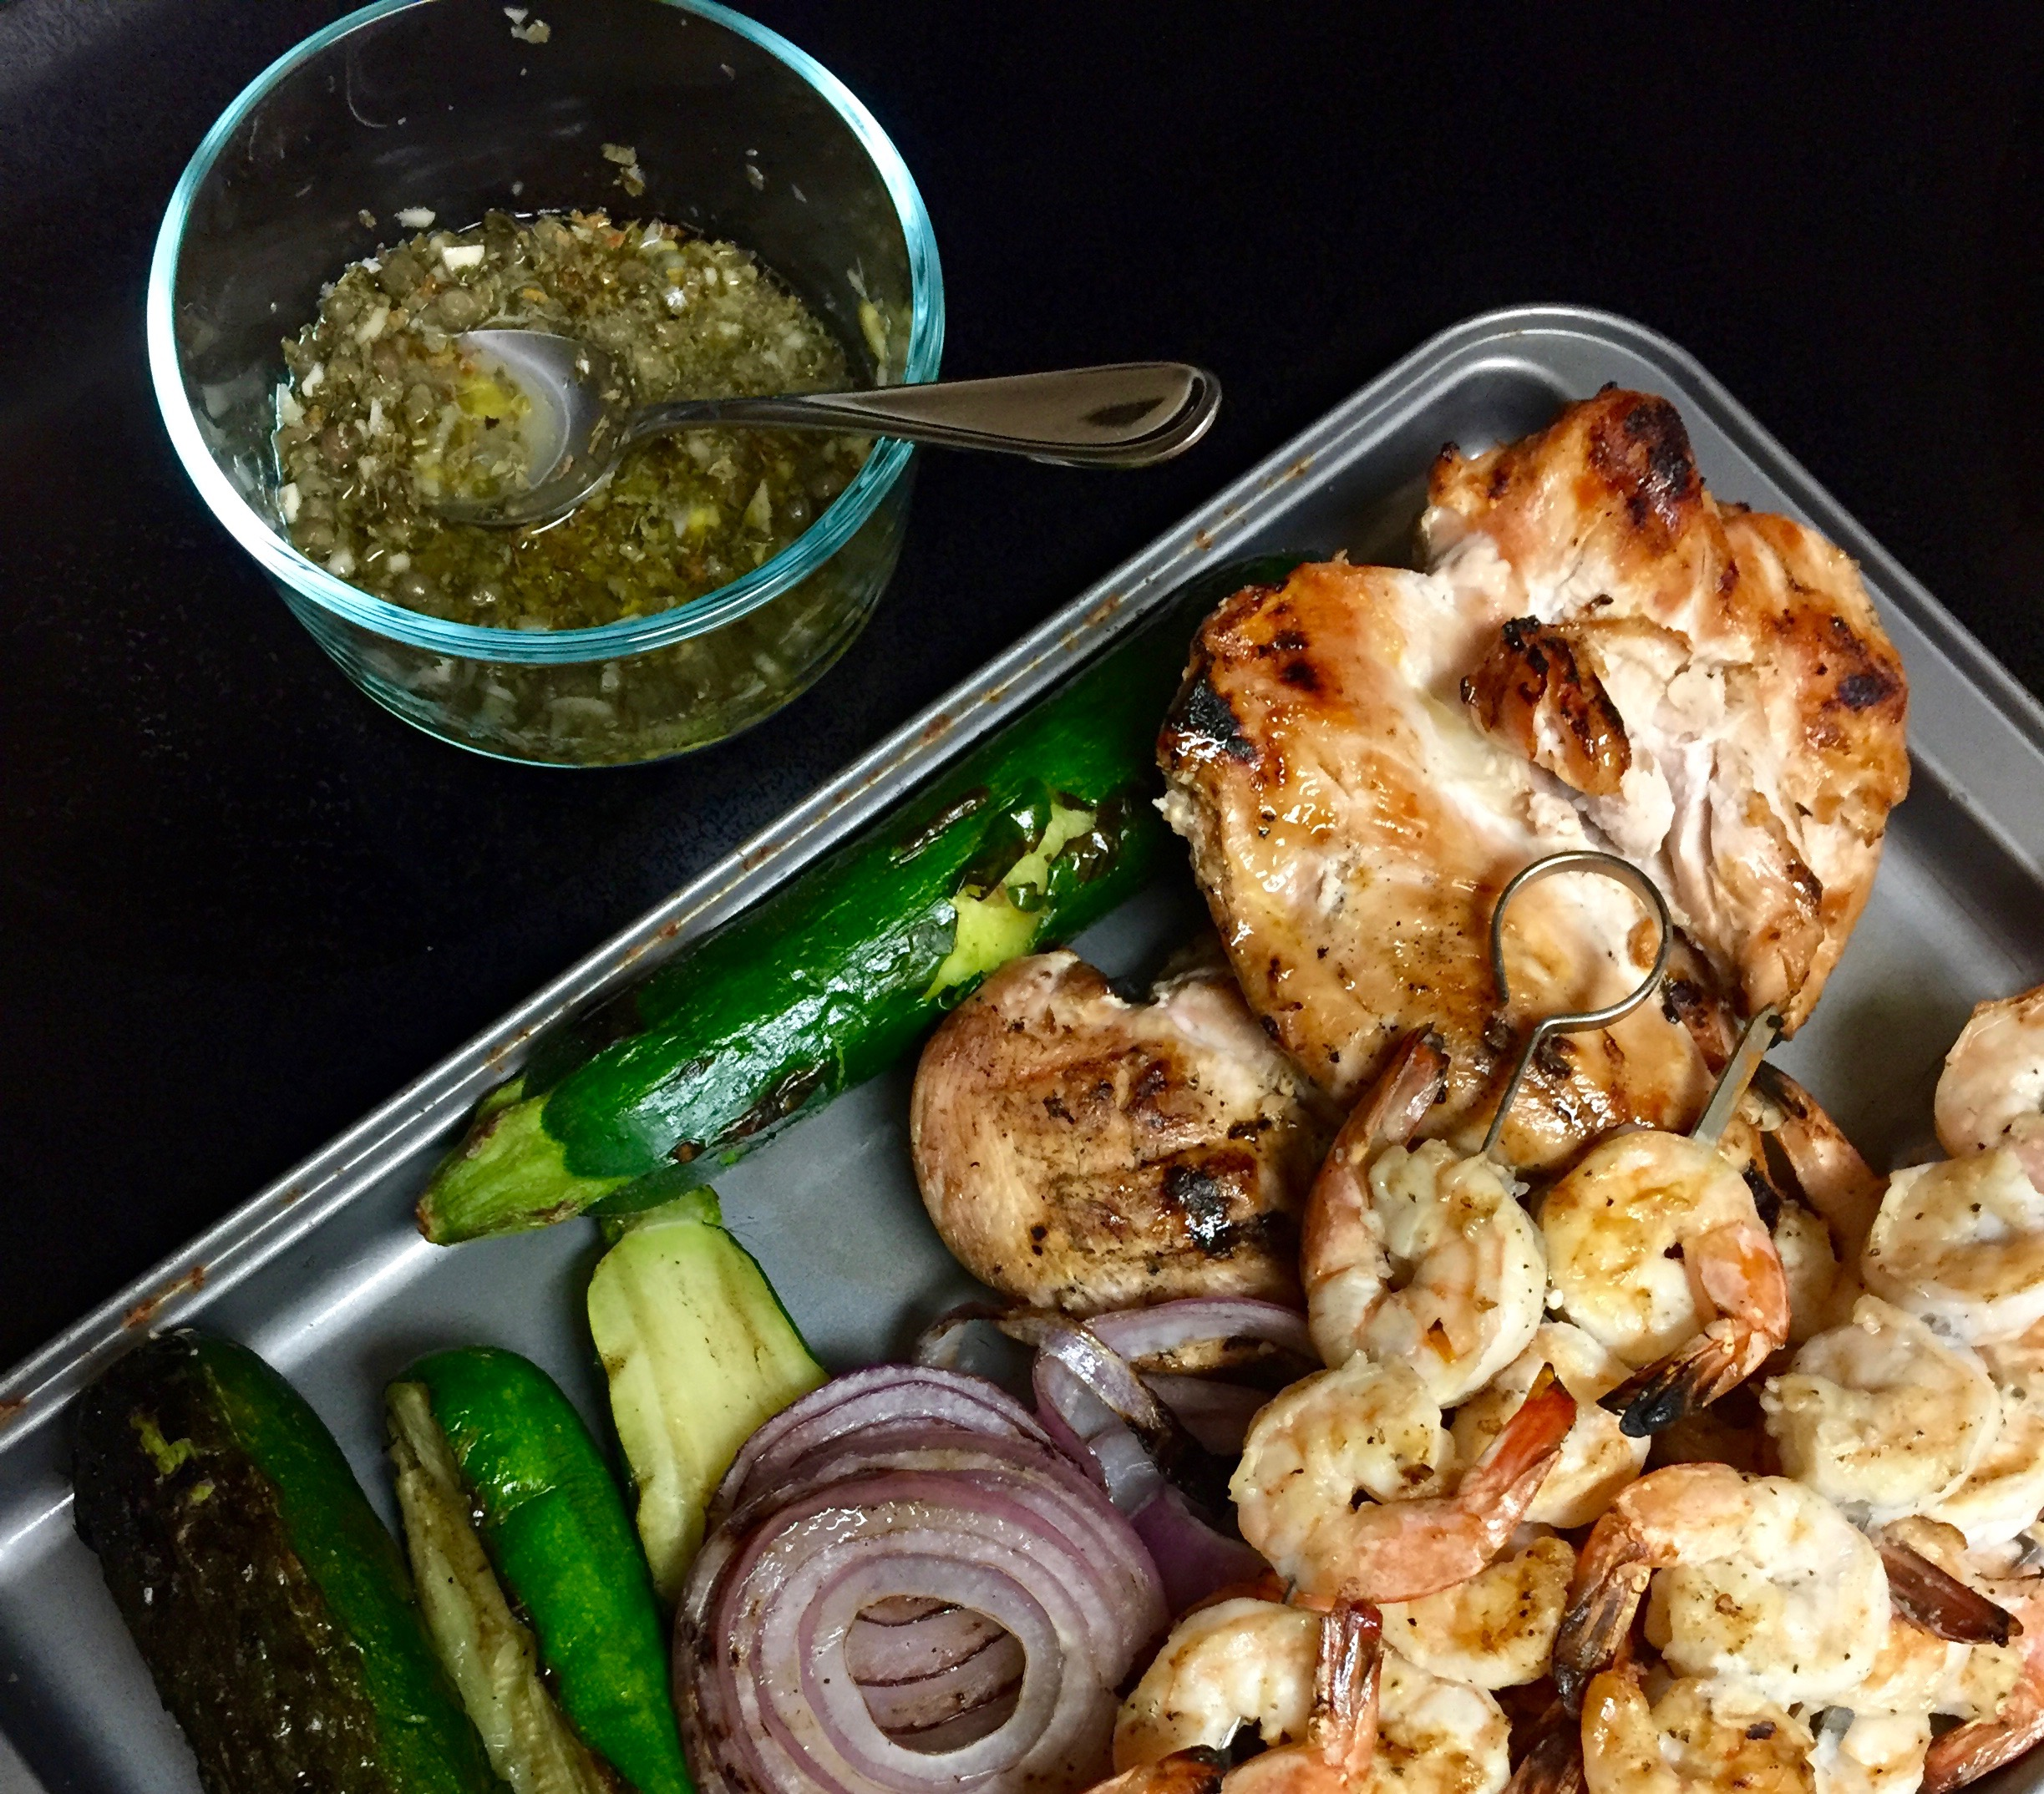 Grilled Garlic Shrimp with Lemon Oregano Caper Drizzle